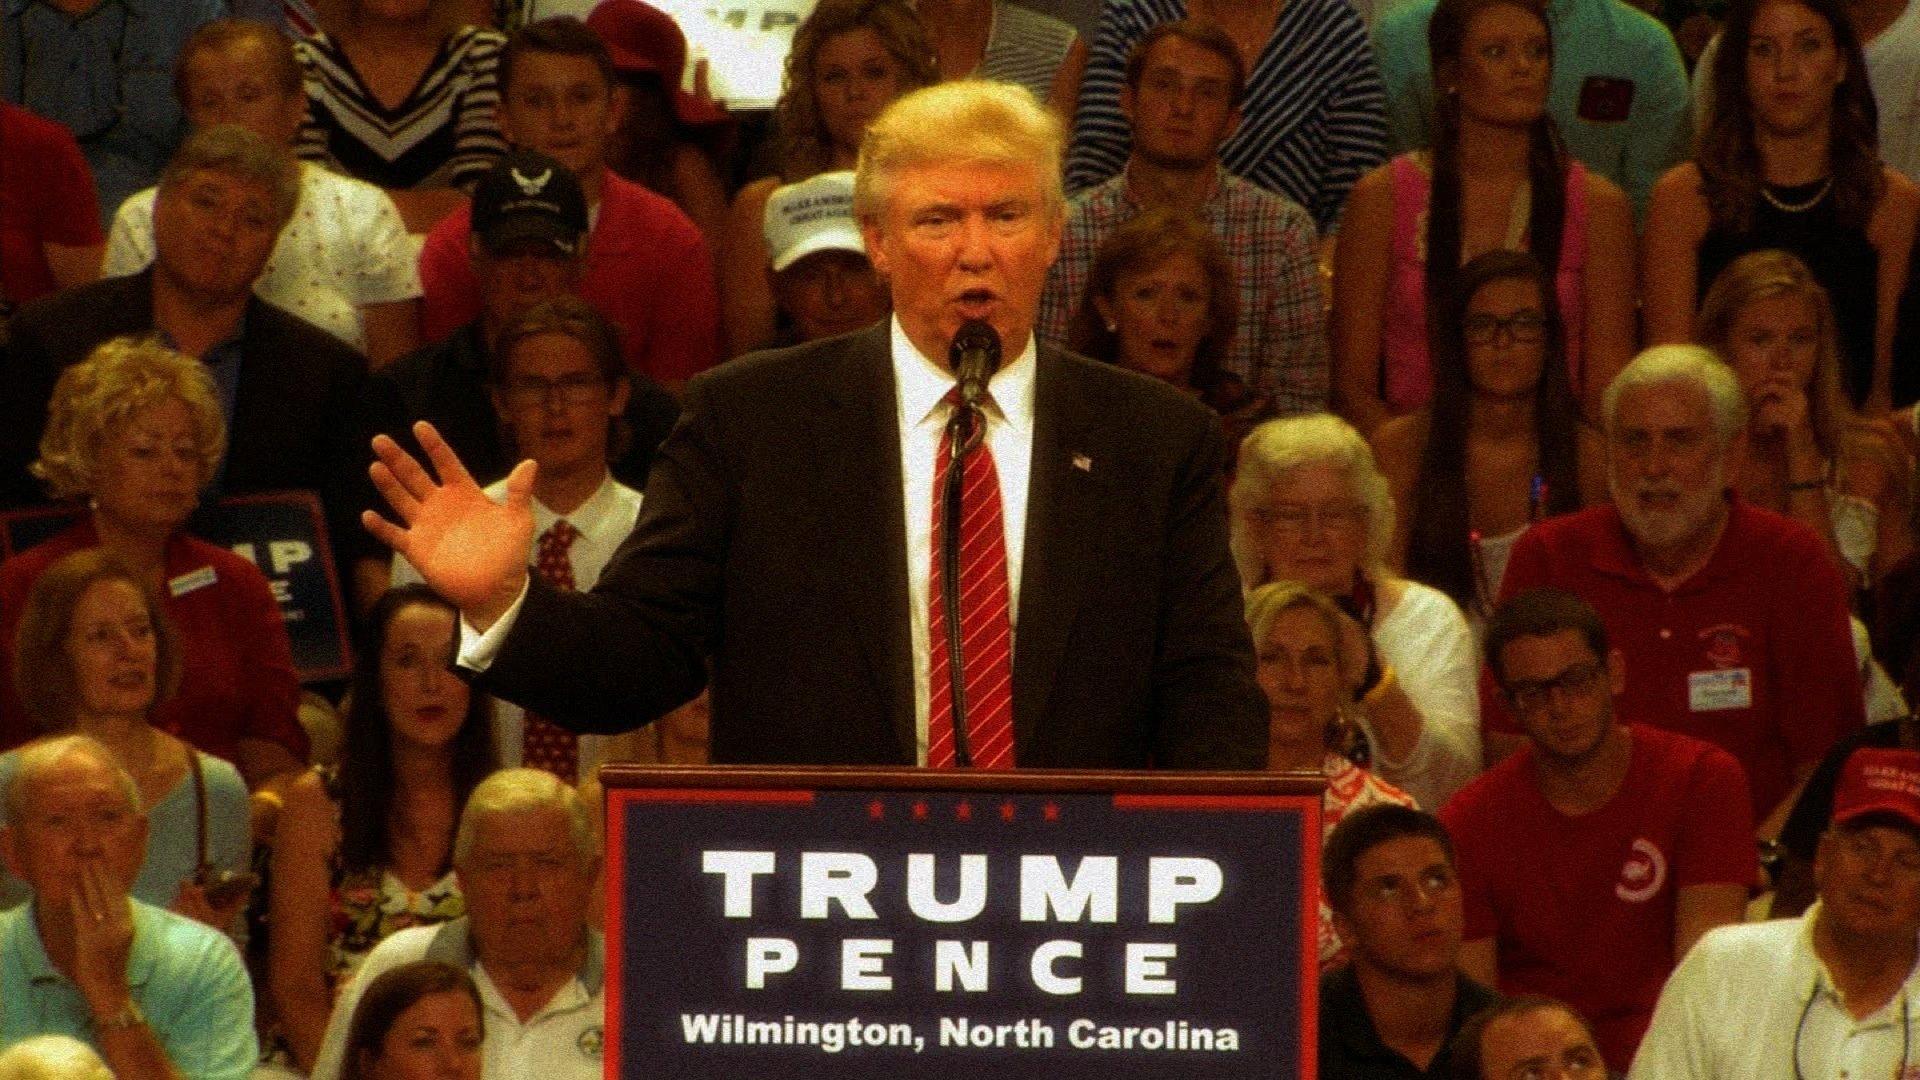 Reagan daughter Patti Davis tells Trump: 'Words matter'